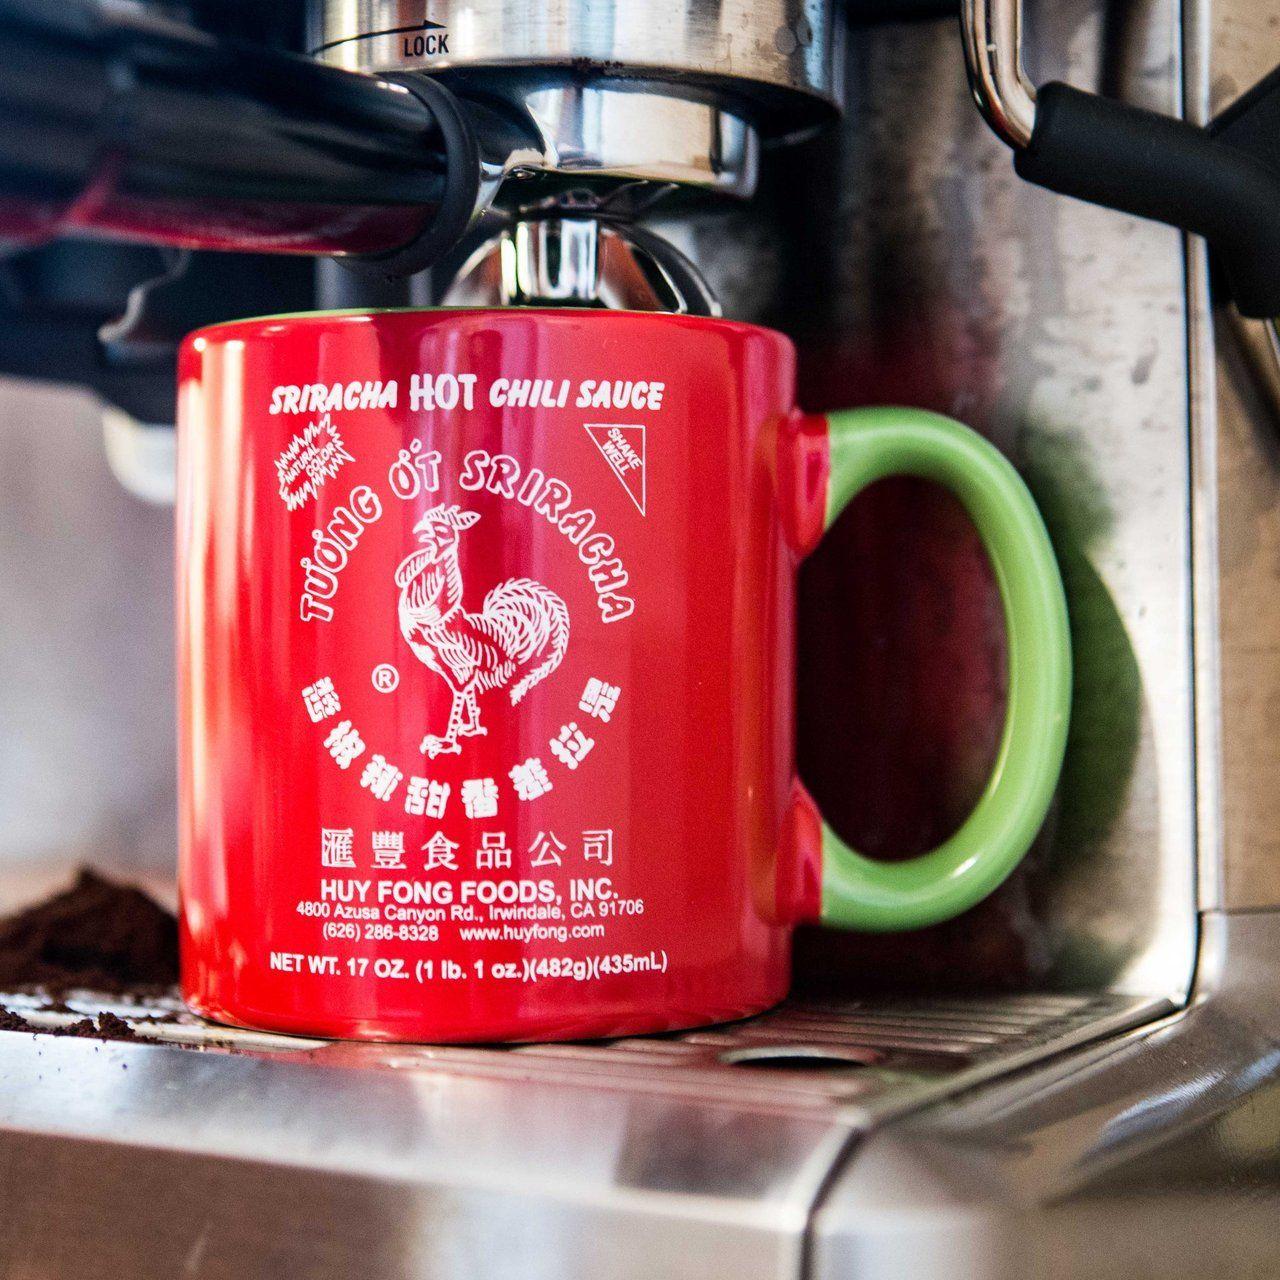 Sriracha Mug Mugs Coffee Games Hot Sauce